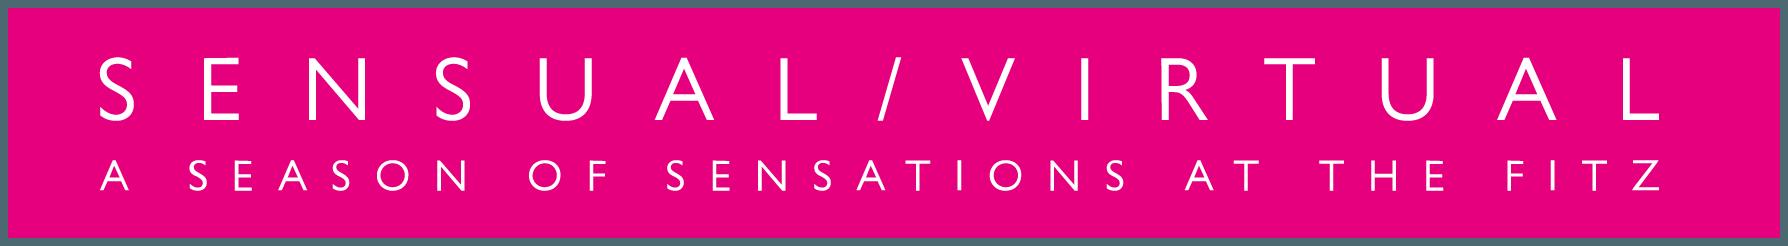 Sensual virtual banner